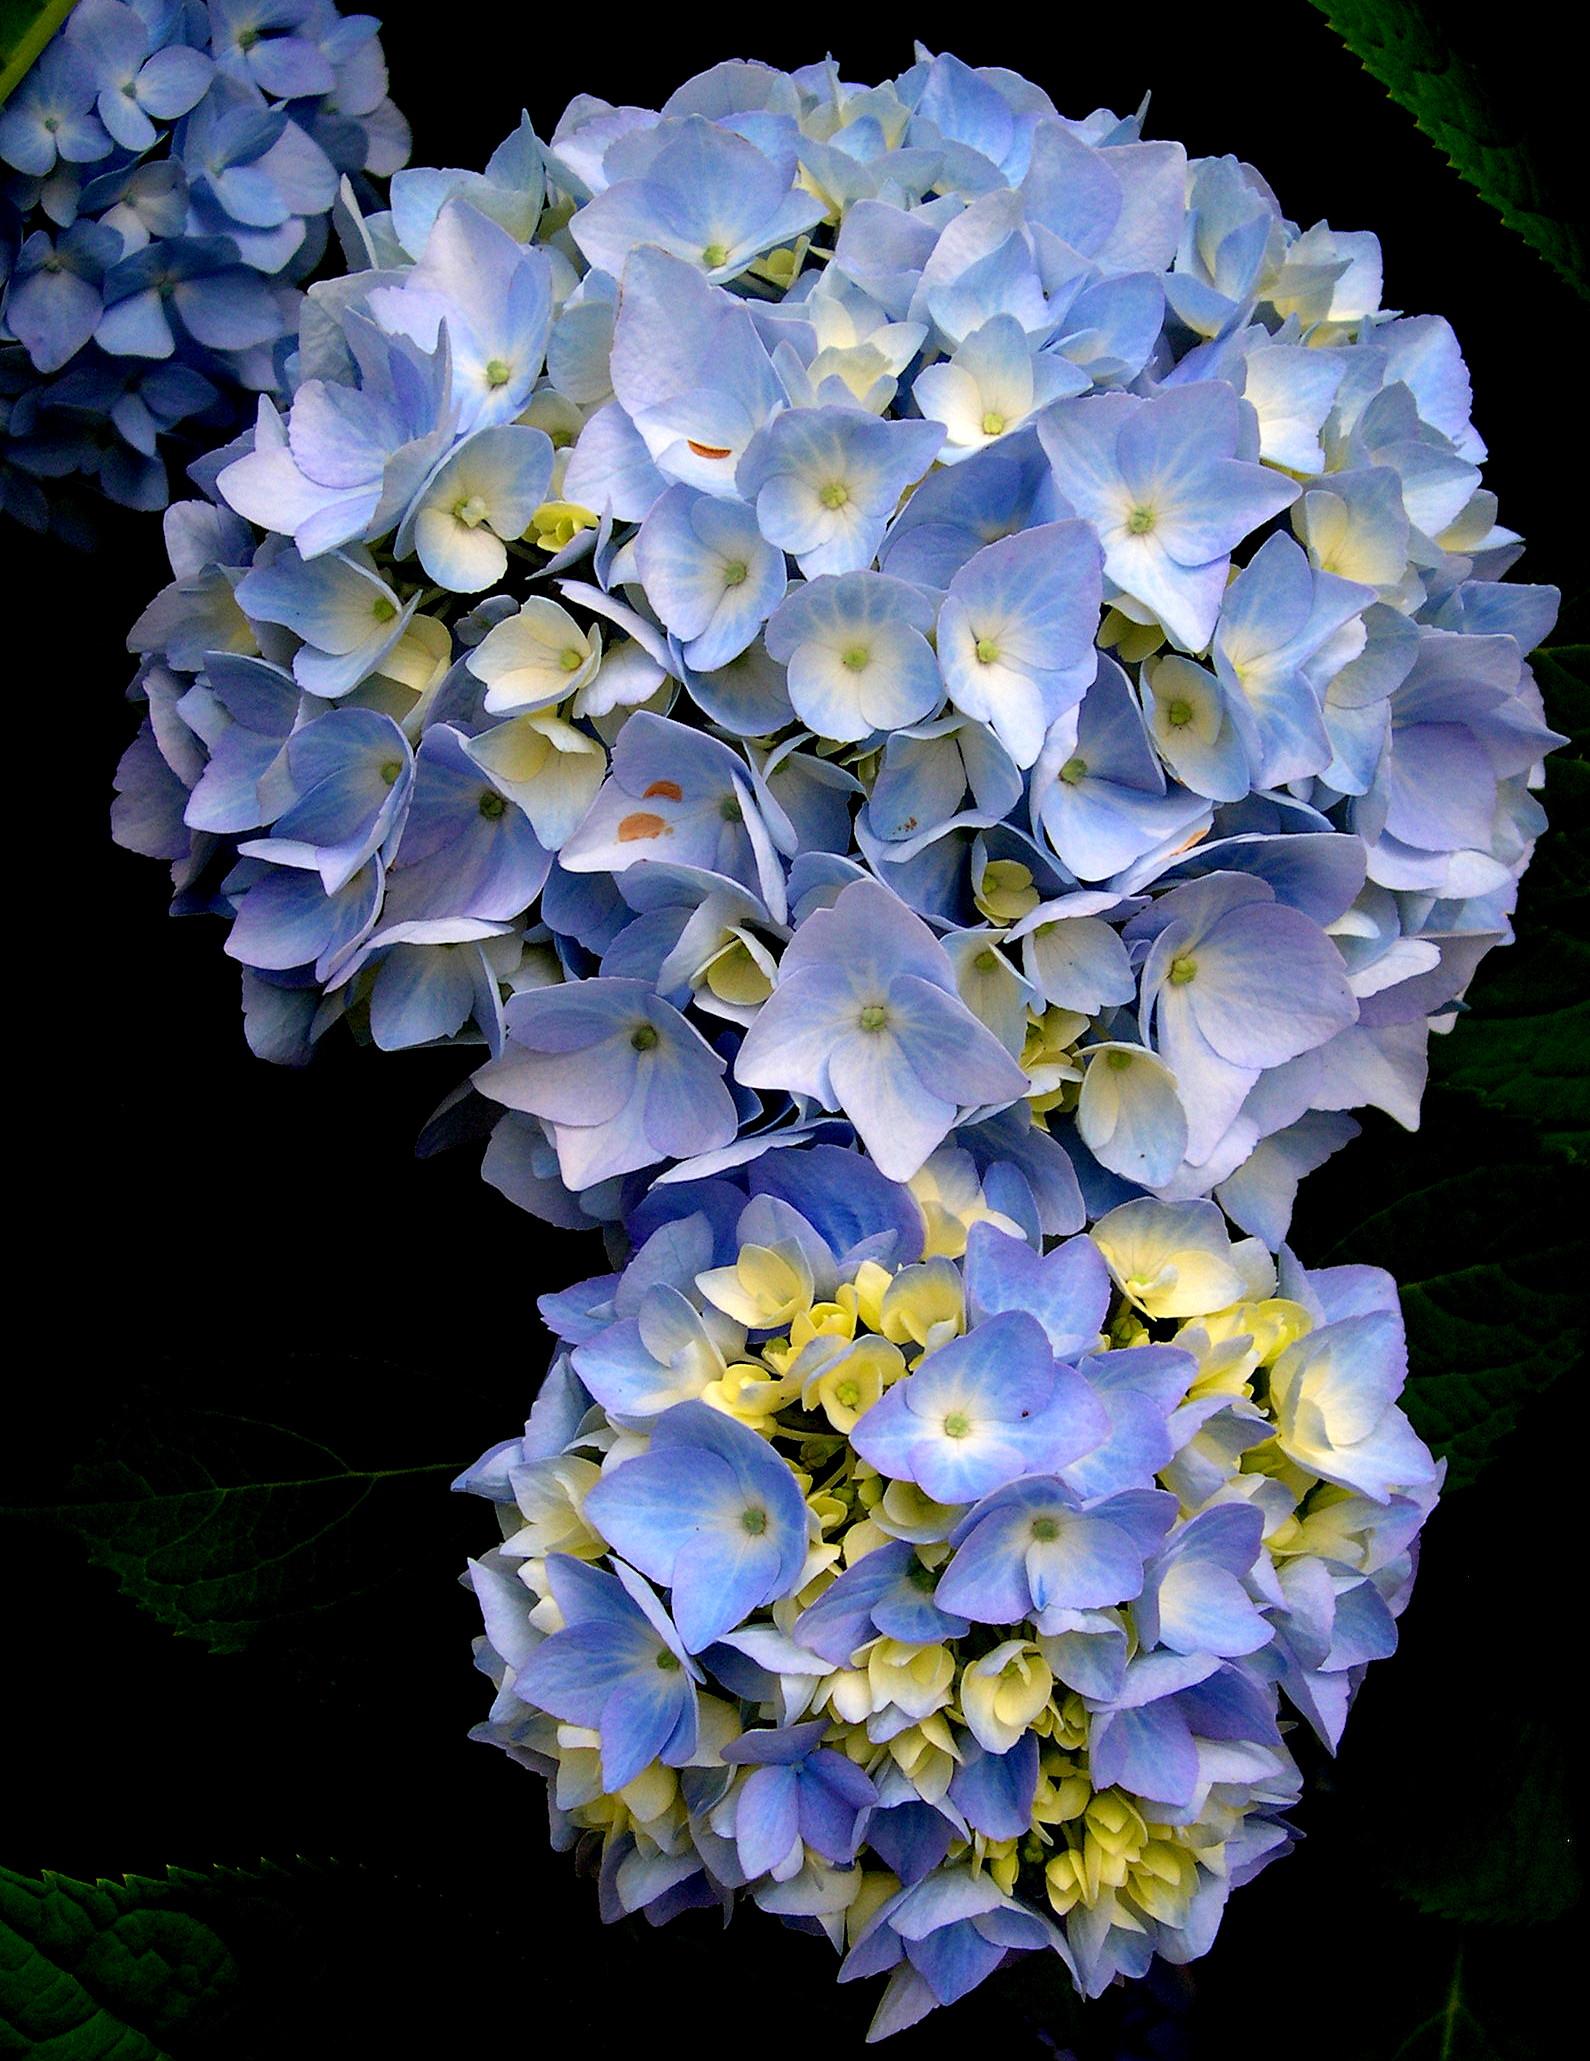 Blue Hydrangeas in Bloom – New England's Narrow Road  Blue